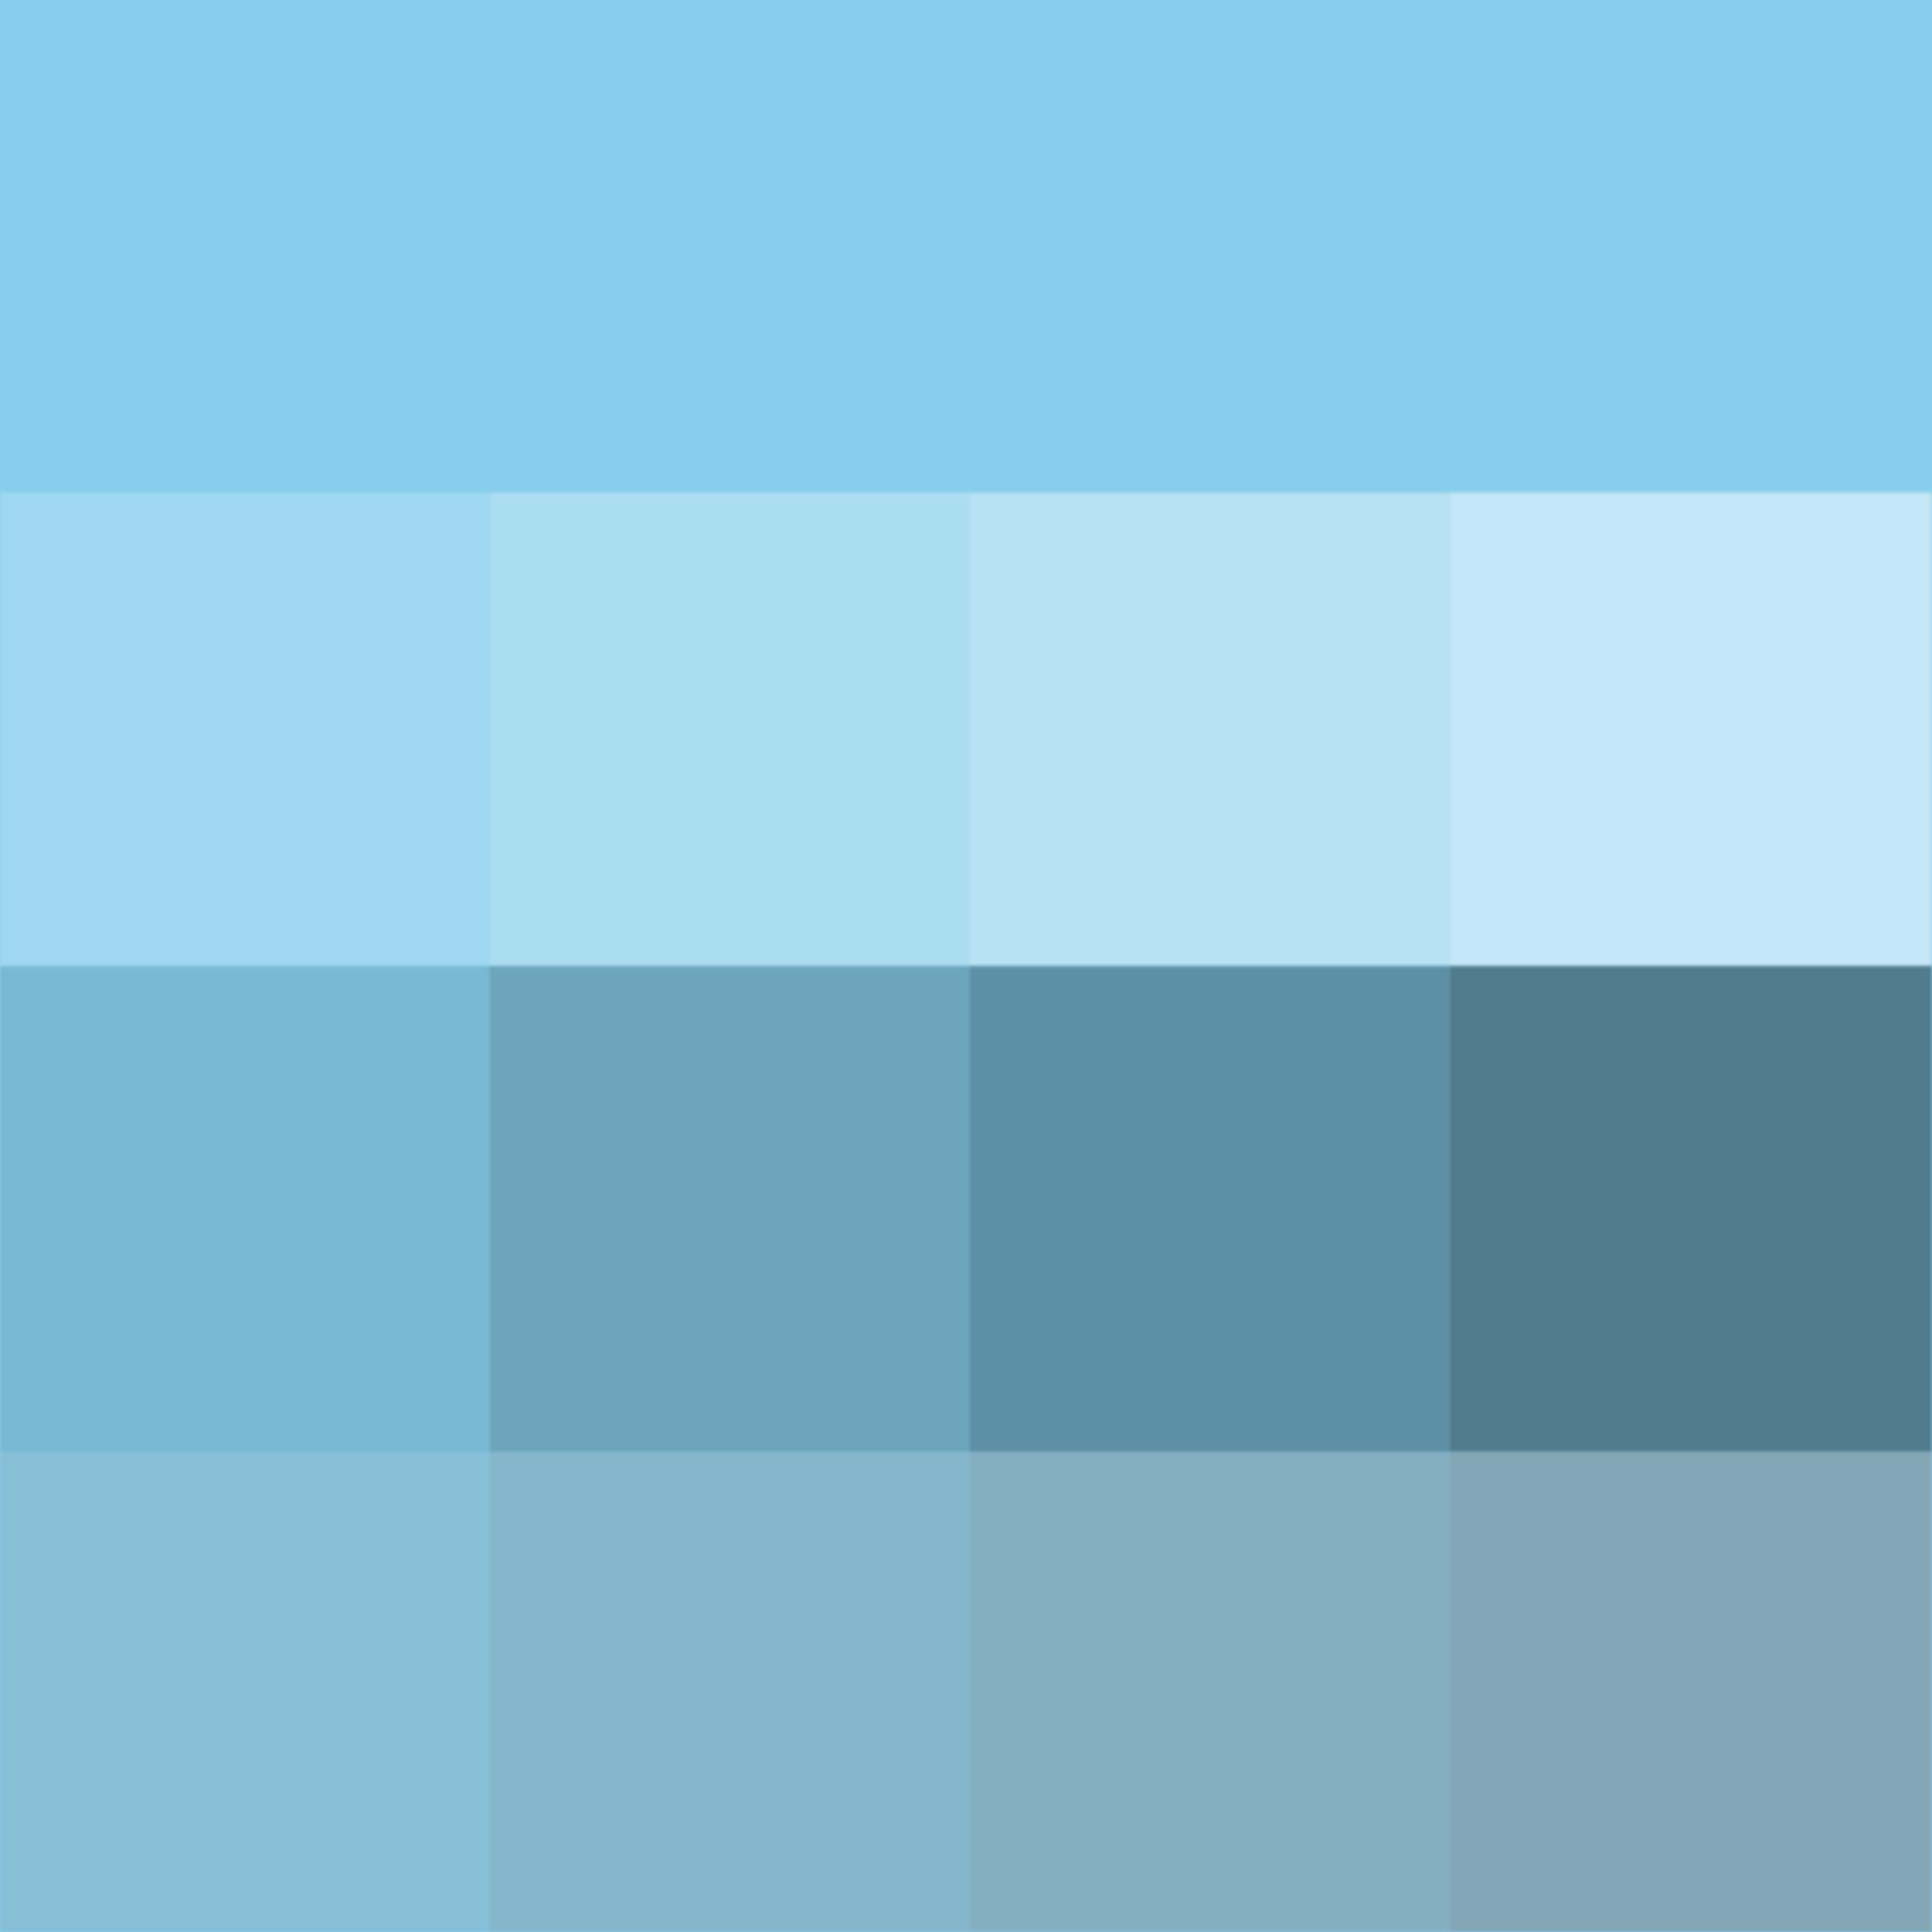 pantone sky blue hue pure color with tints hue white - Light Sky Blue Color